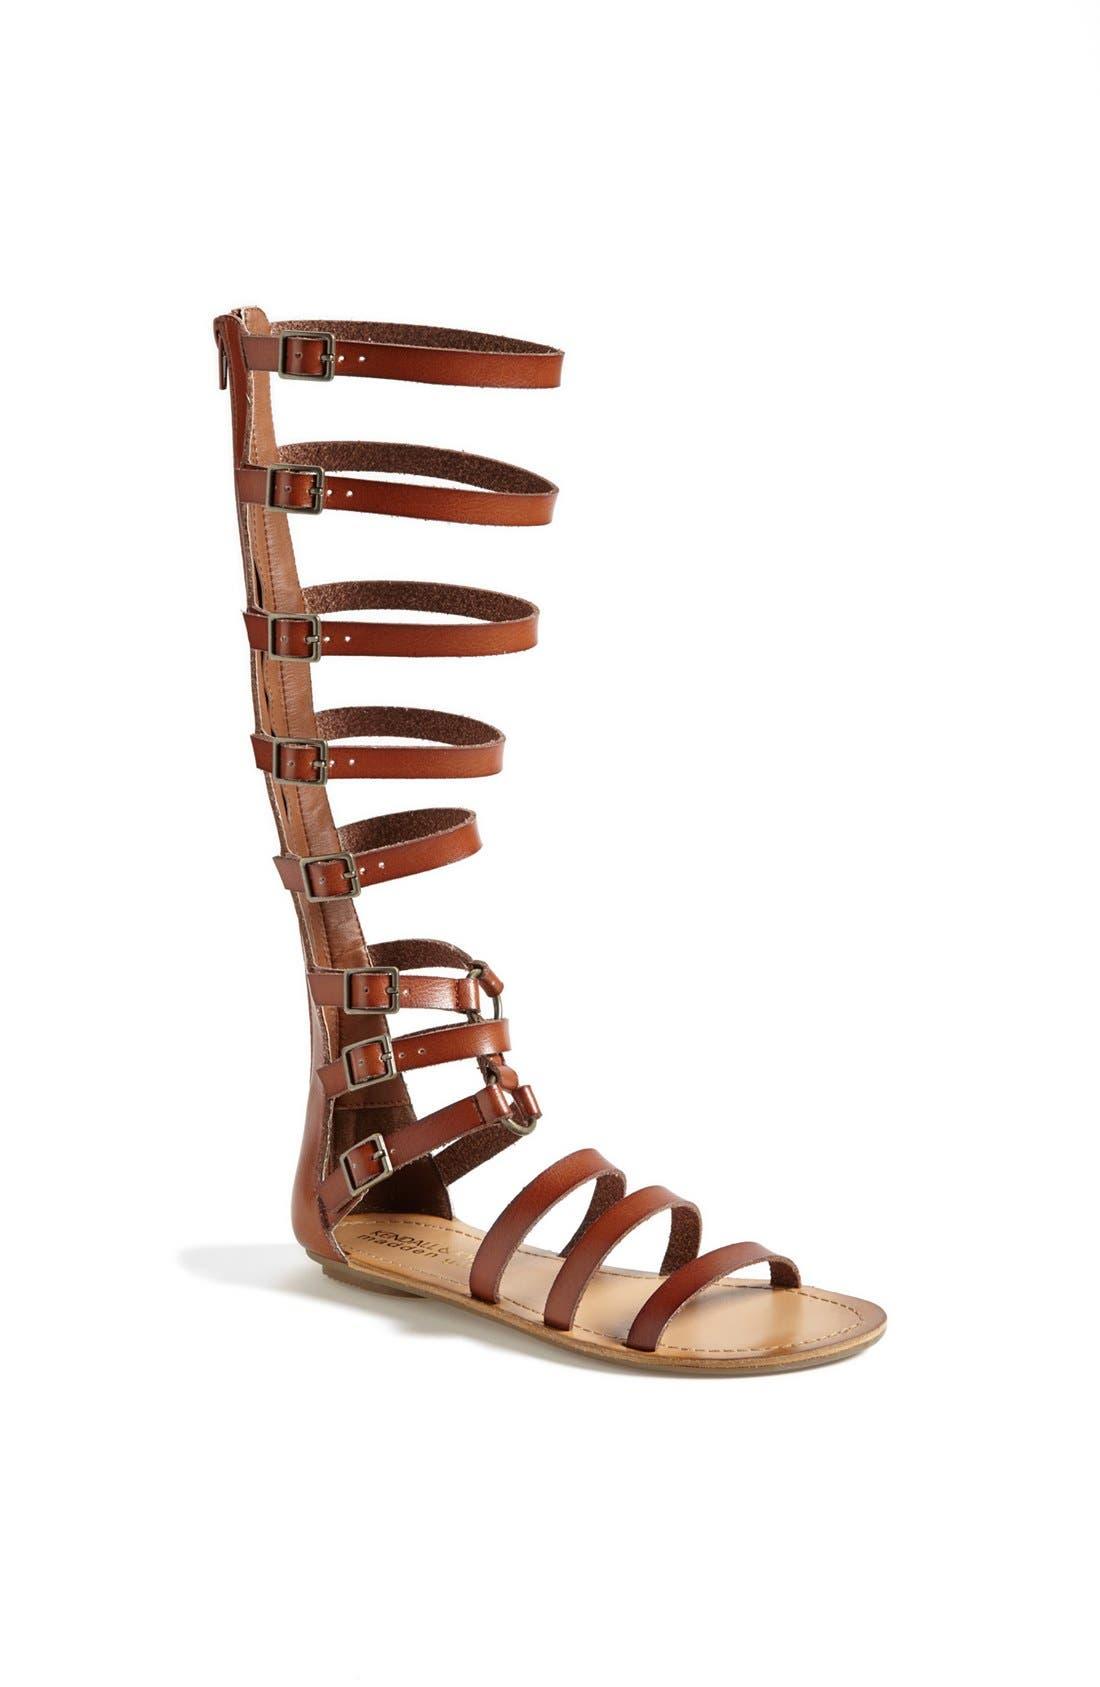 Alternate Image 1 Selected - KENDALL + KYLIE Madden Girl 'Seriious' Sandal